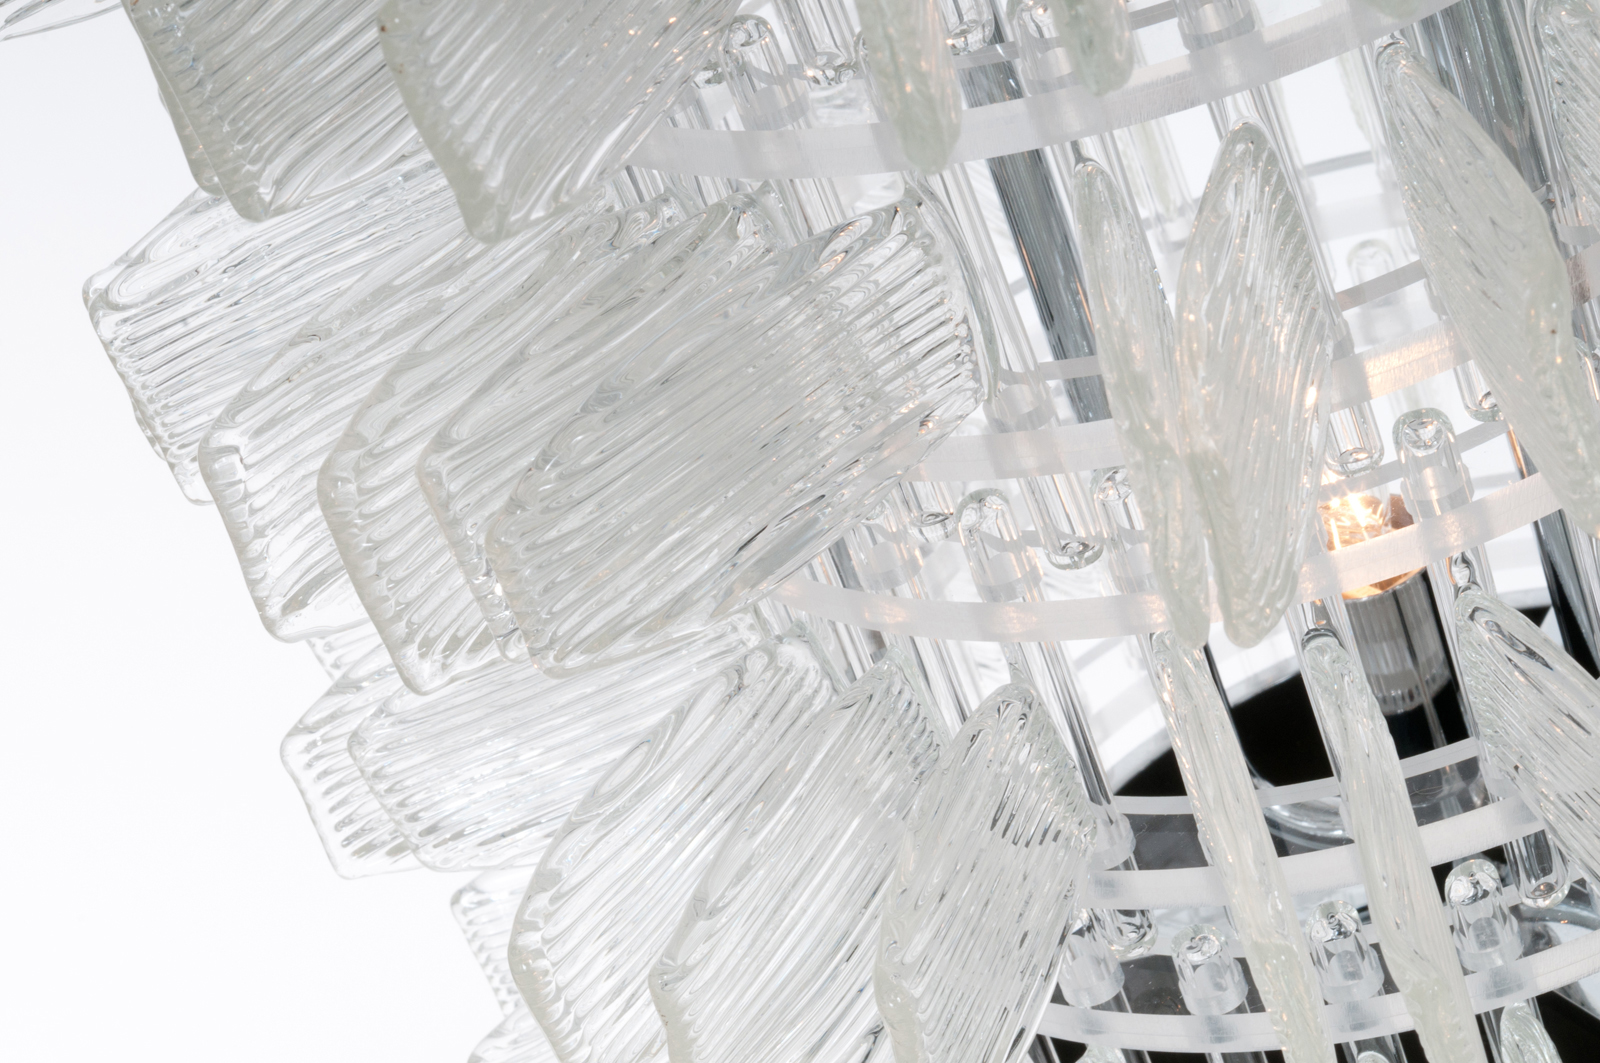 anemone-32-table-chrome-cristal-crystal-veronese-maurizio-galante-tal-lancman-31.jpg